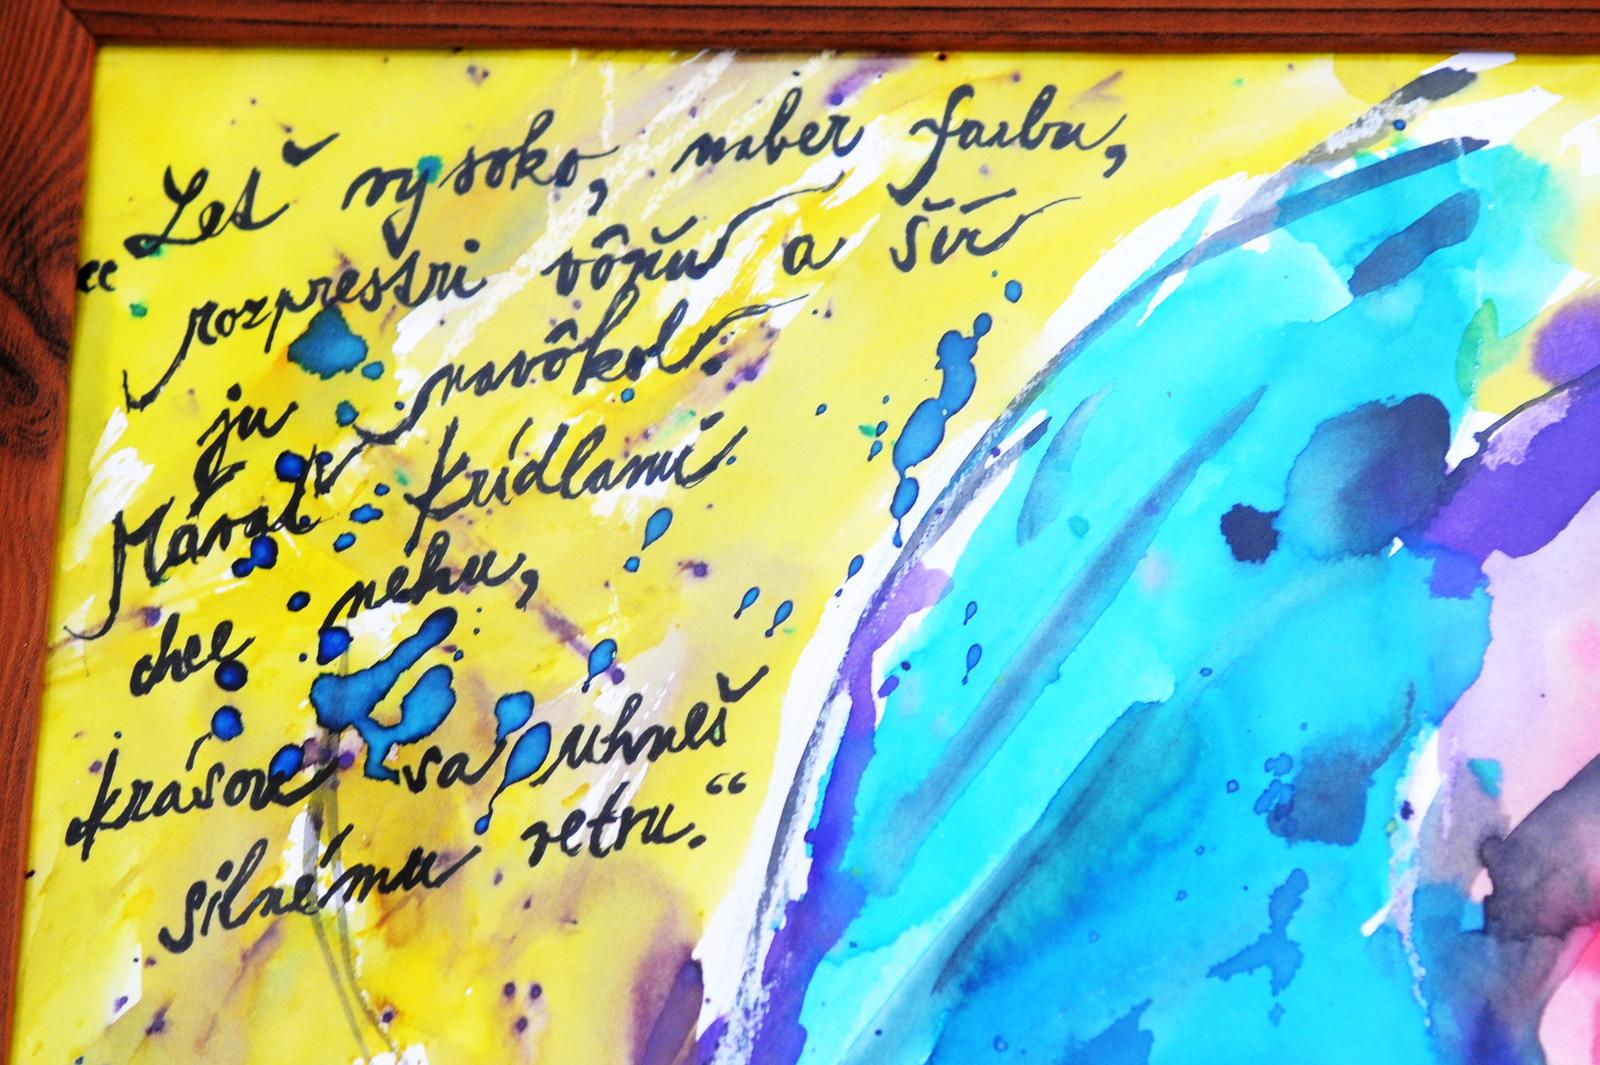 Skusam patlat.... :-P - moja báseň, nebáseň :-).... taká abstraktná...... :-).....